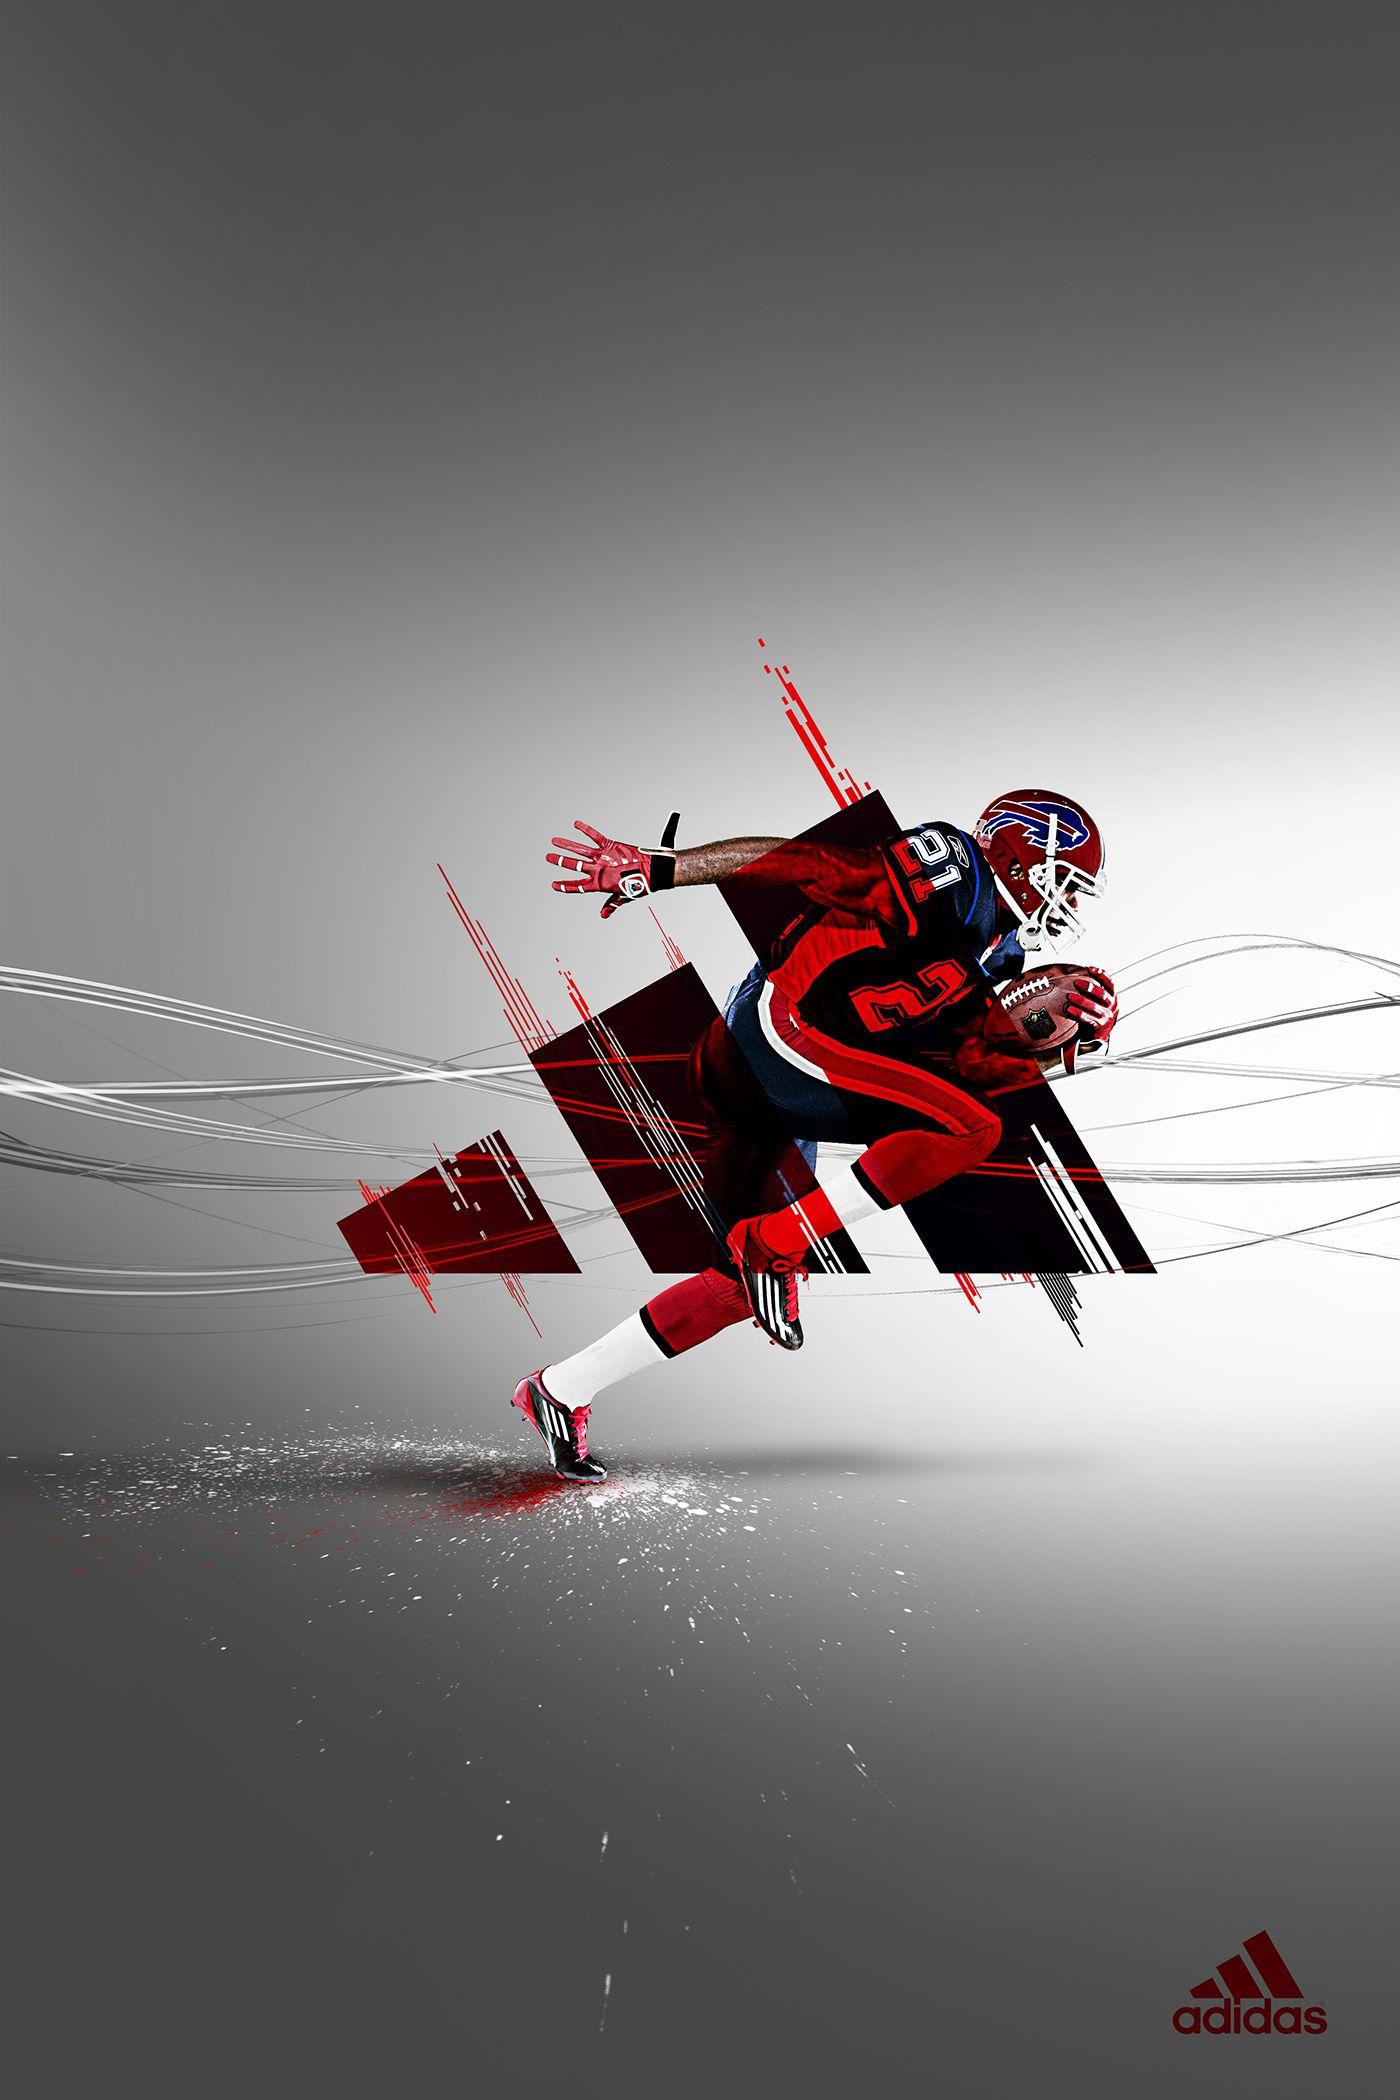 Adidas | Advertisement on Behance | Graphic design 그래픽디자인 ...